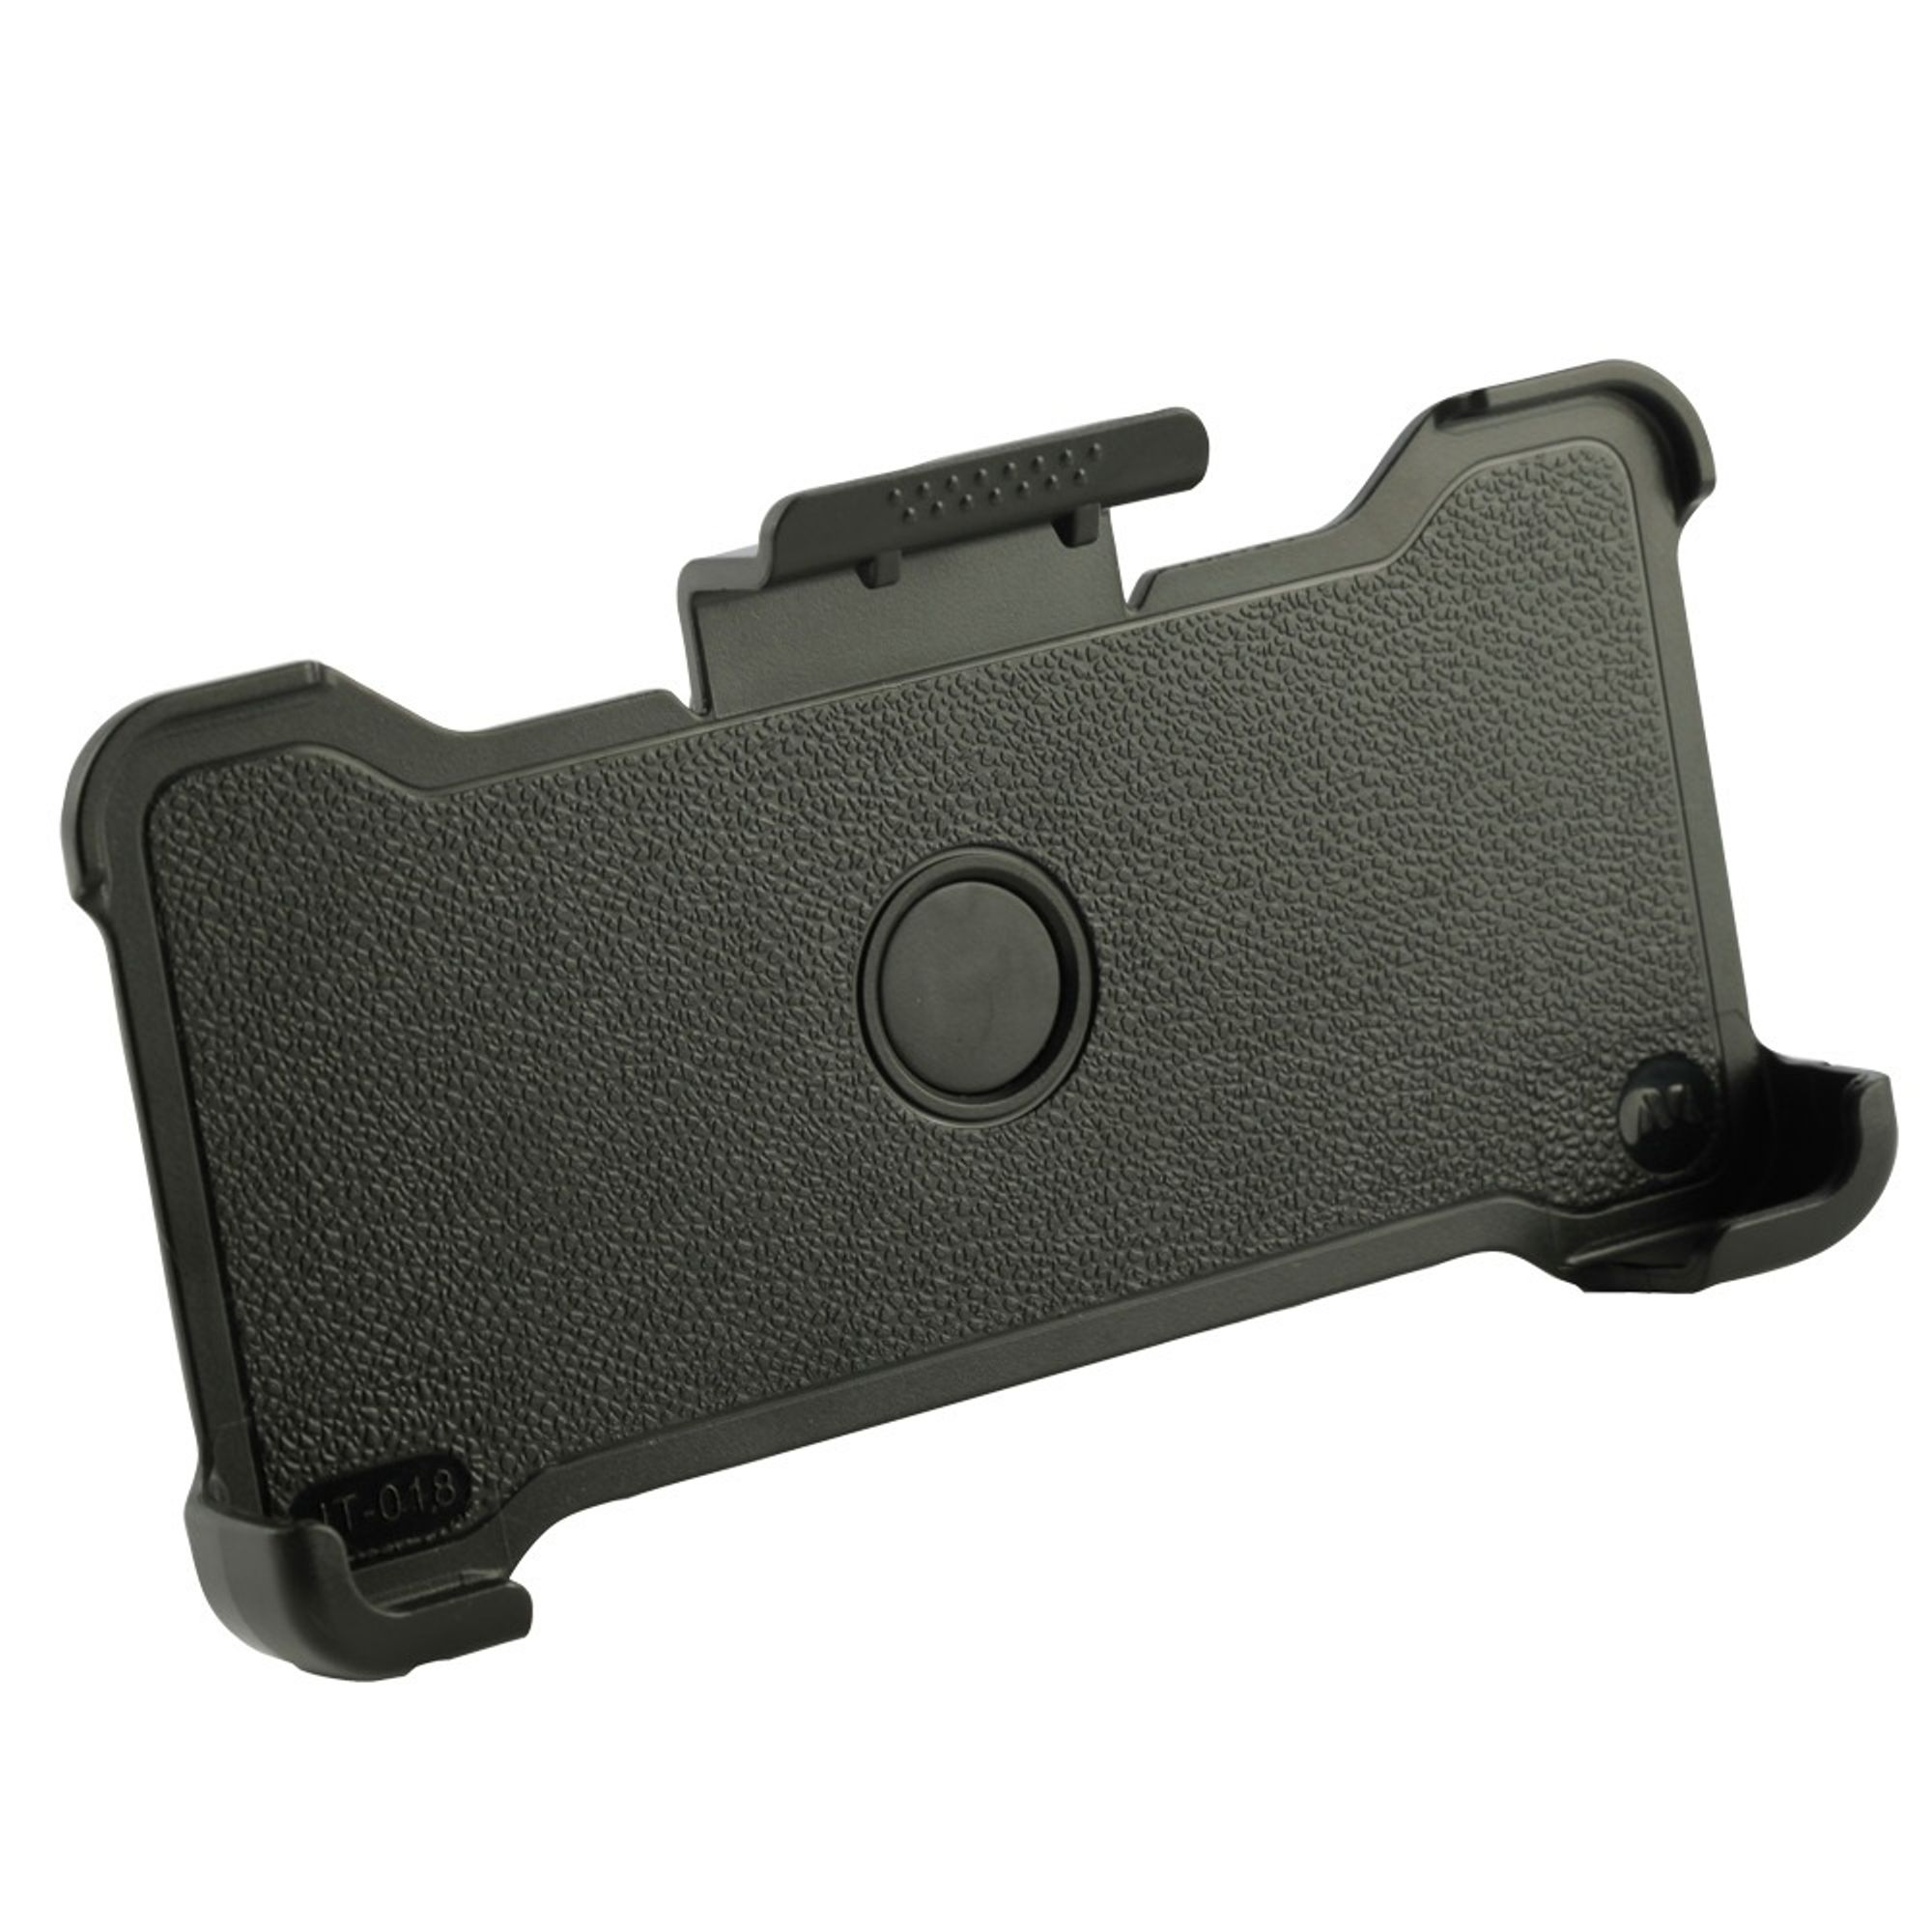 MyBat Hard Snap-in Holster Belt Clip For Samsung Galaxy Note 8, Black